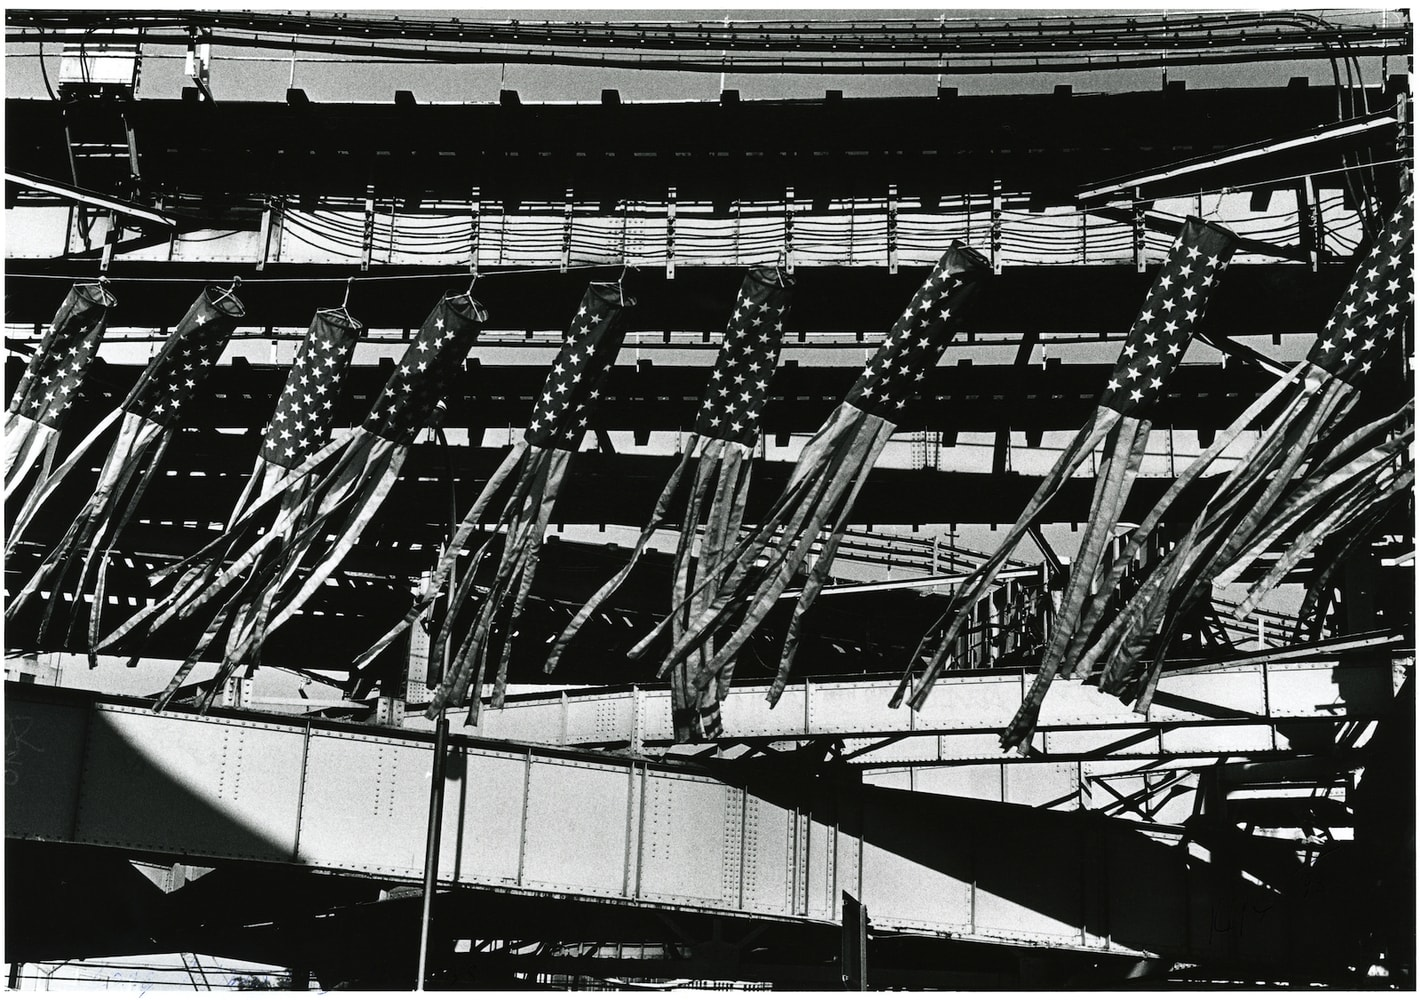 Sid Kaplan, Paper lanterns, Long Island City, New York City, 1998